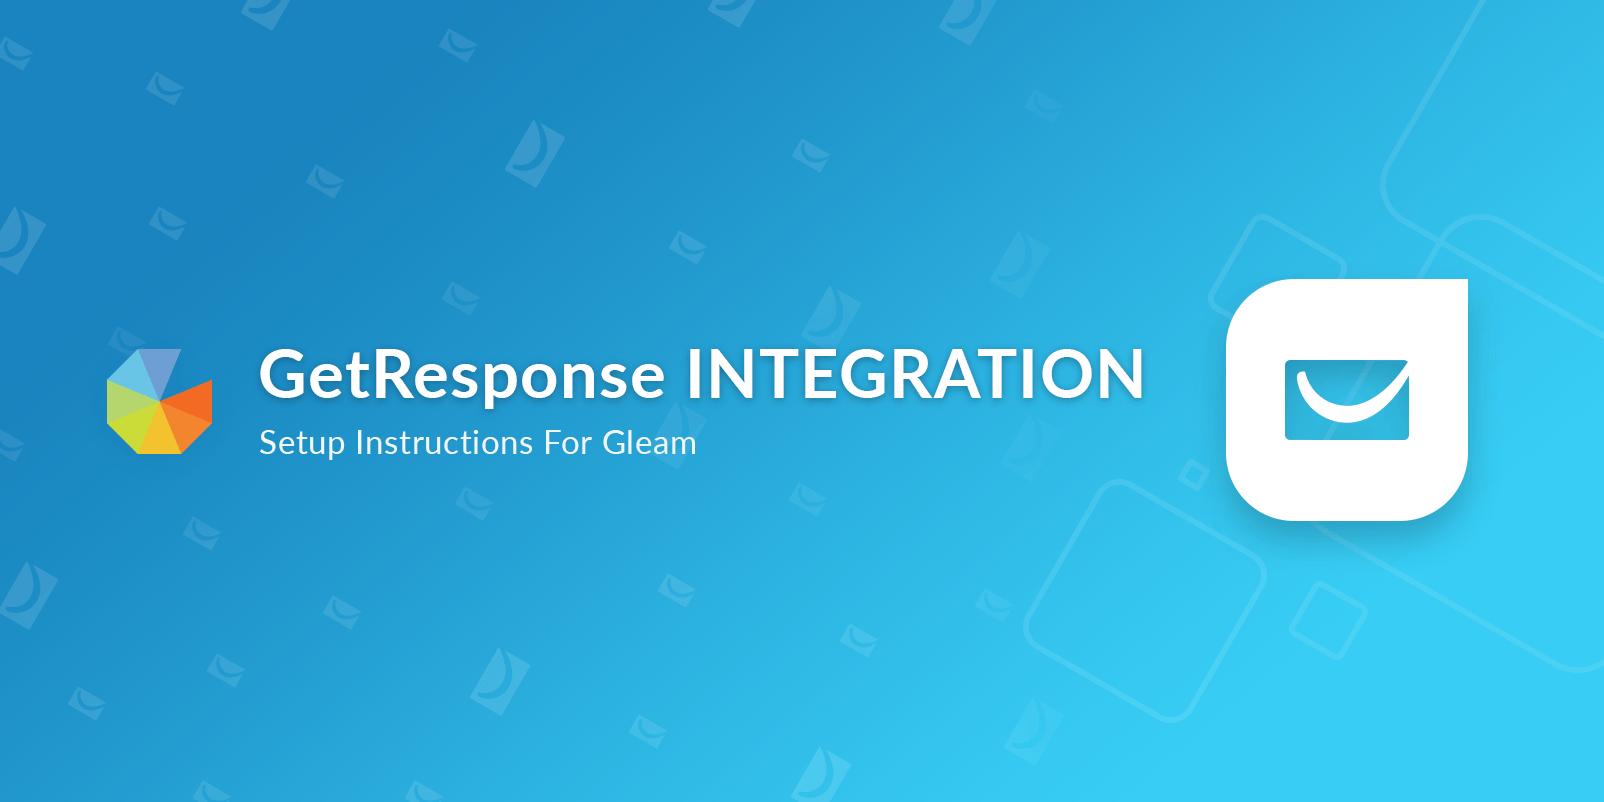 gleam getresponse integration